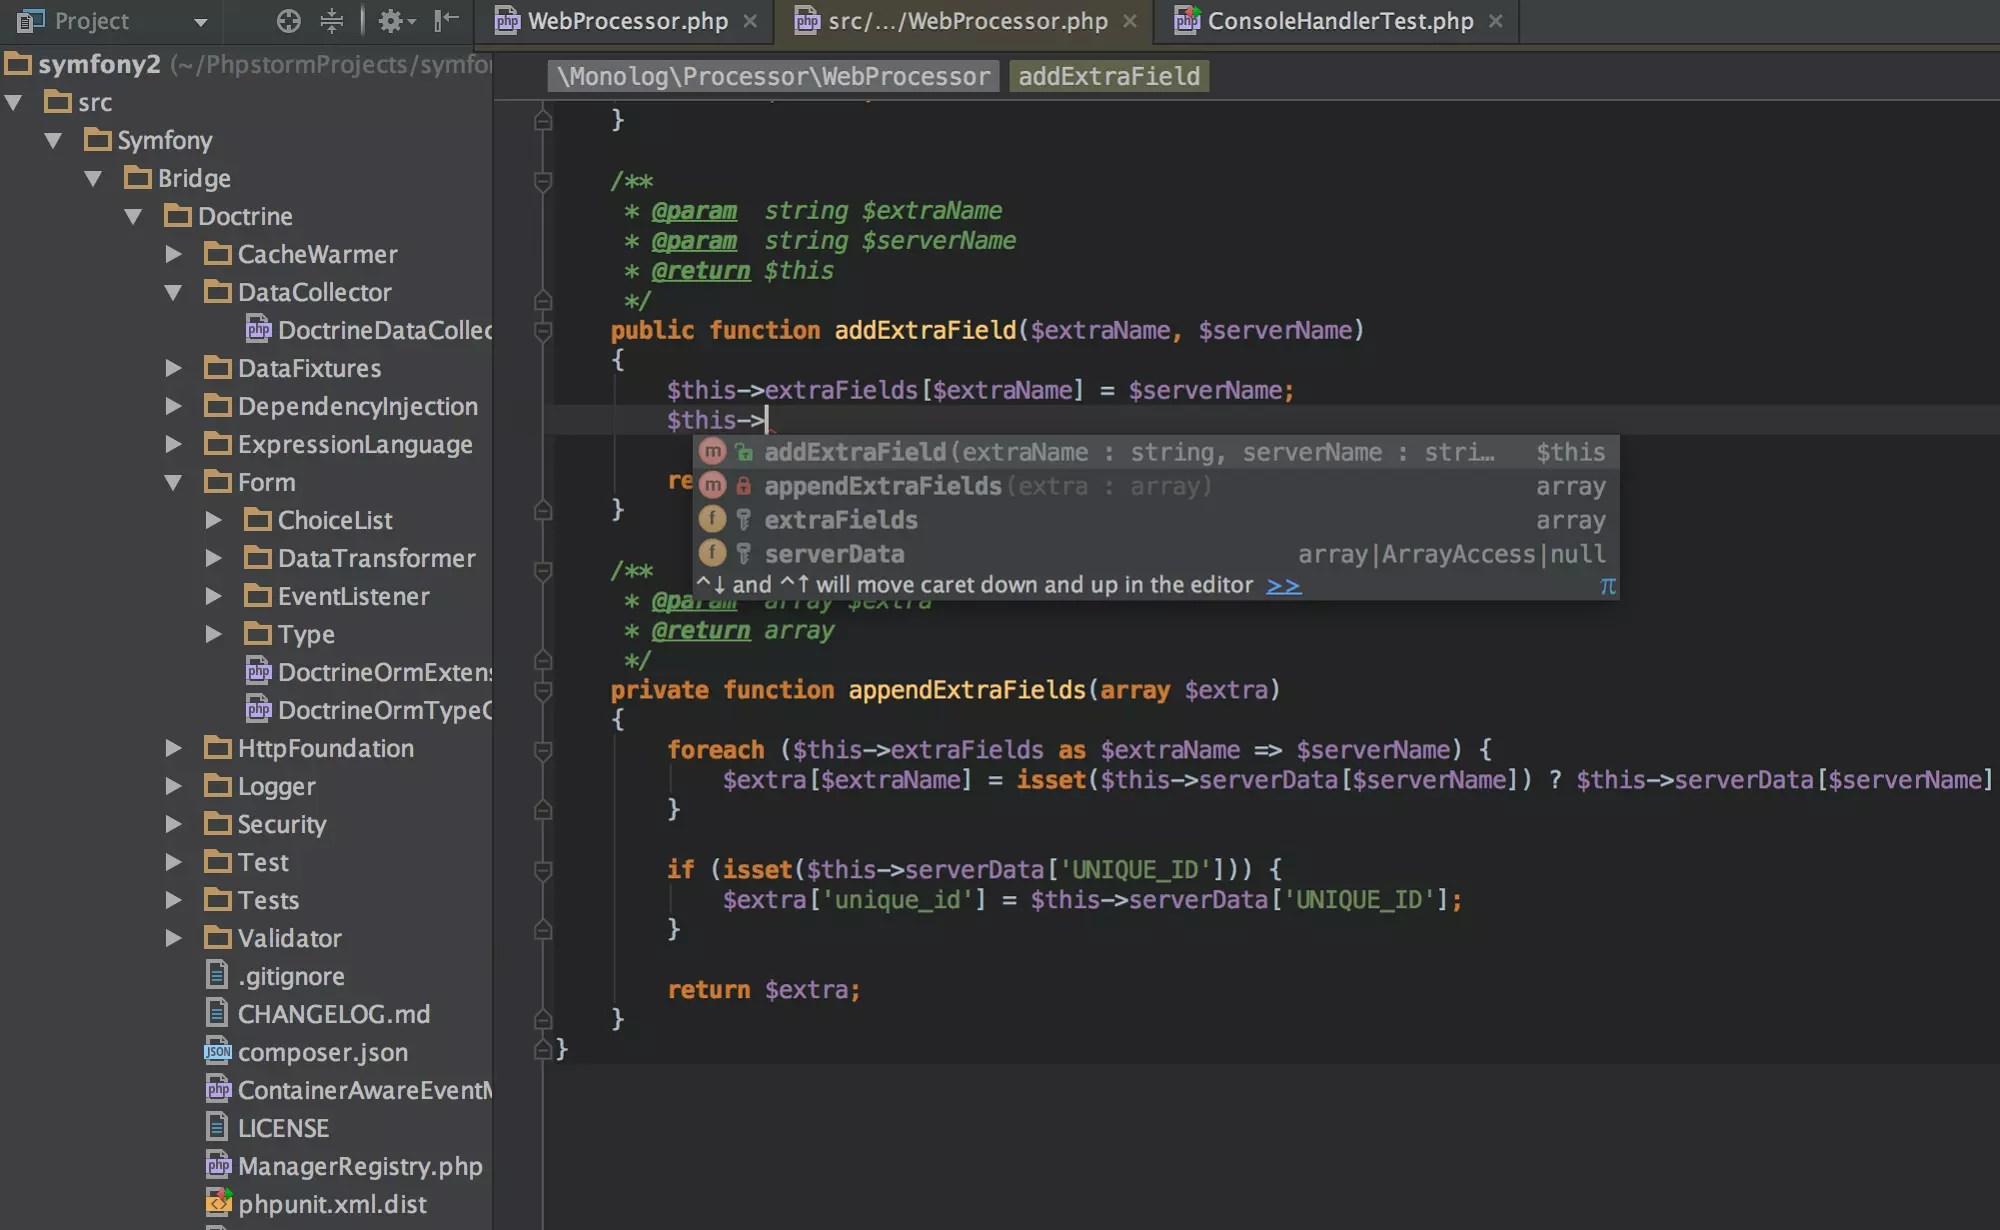 PhpStorm The LightningSmart IDE for PHP Programming by